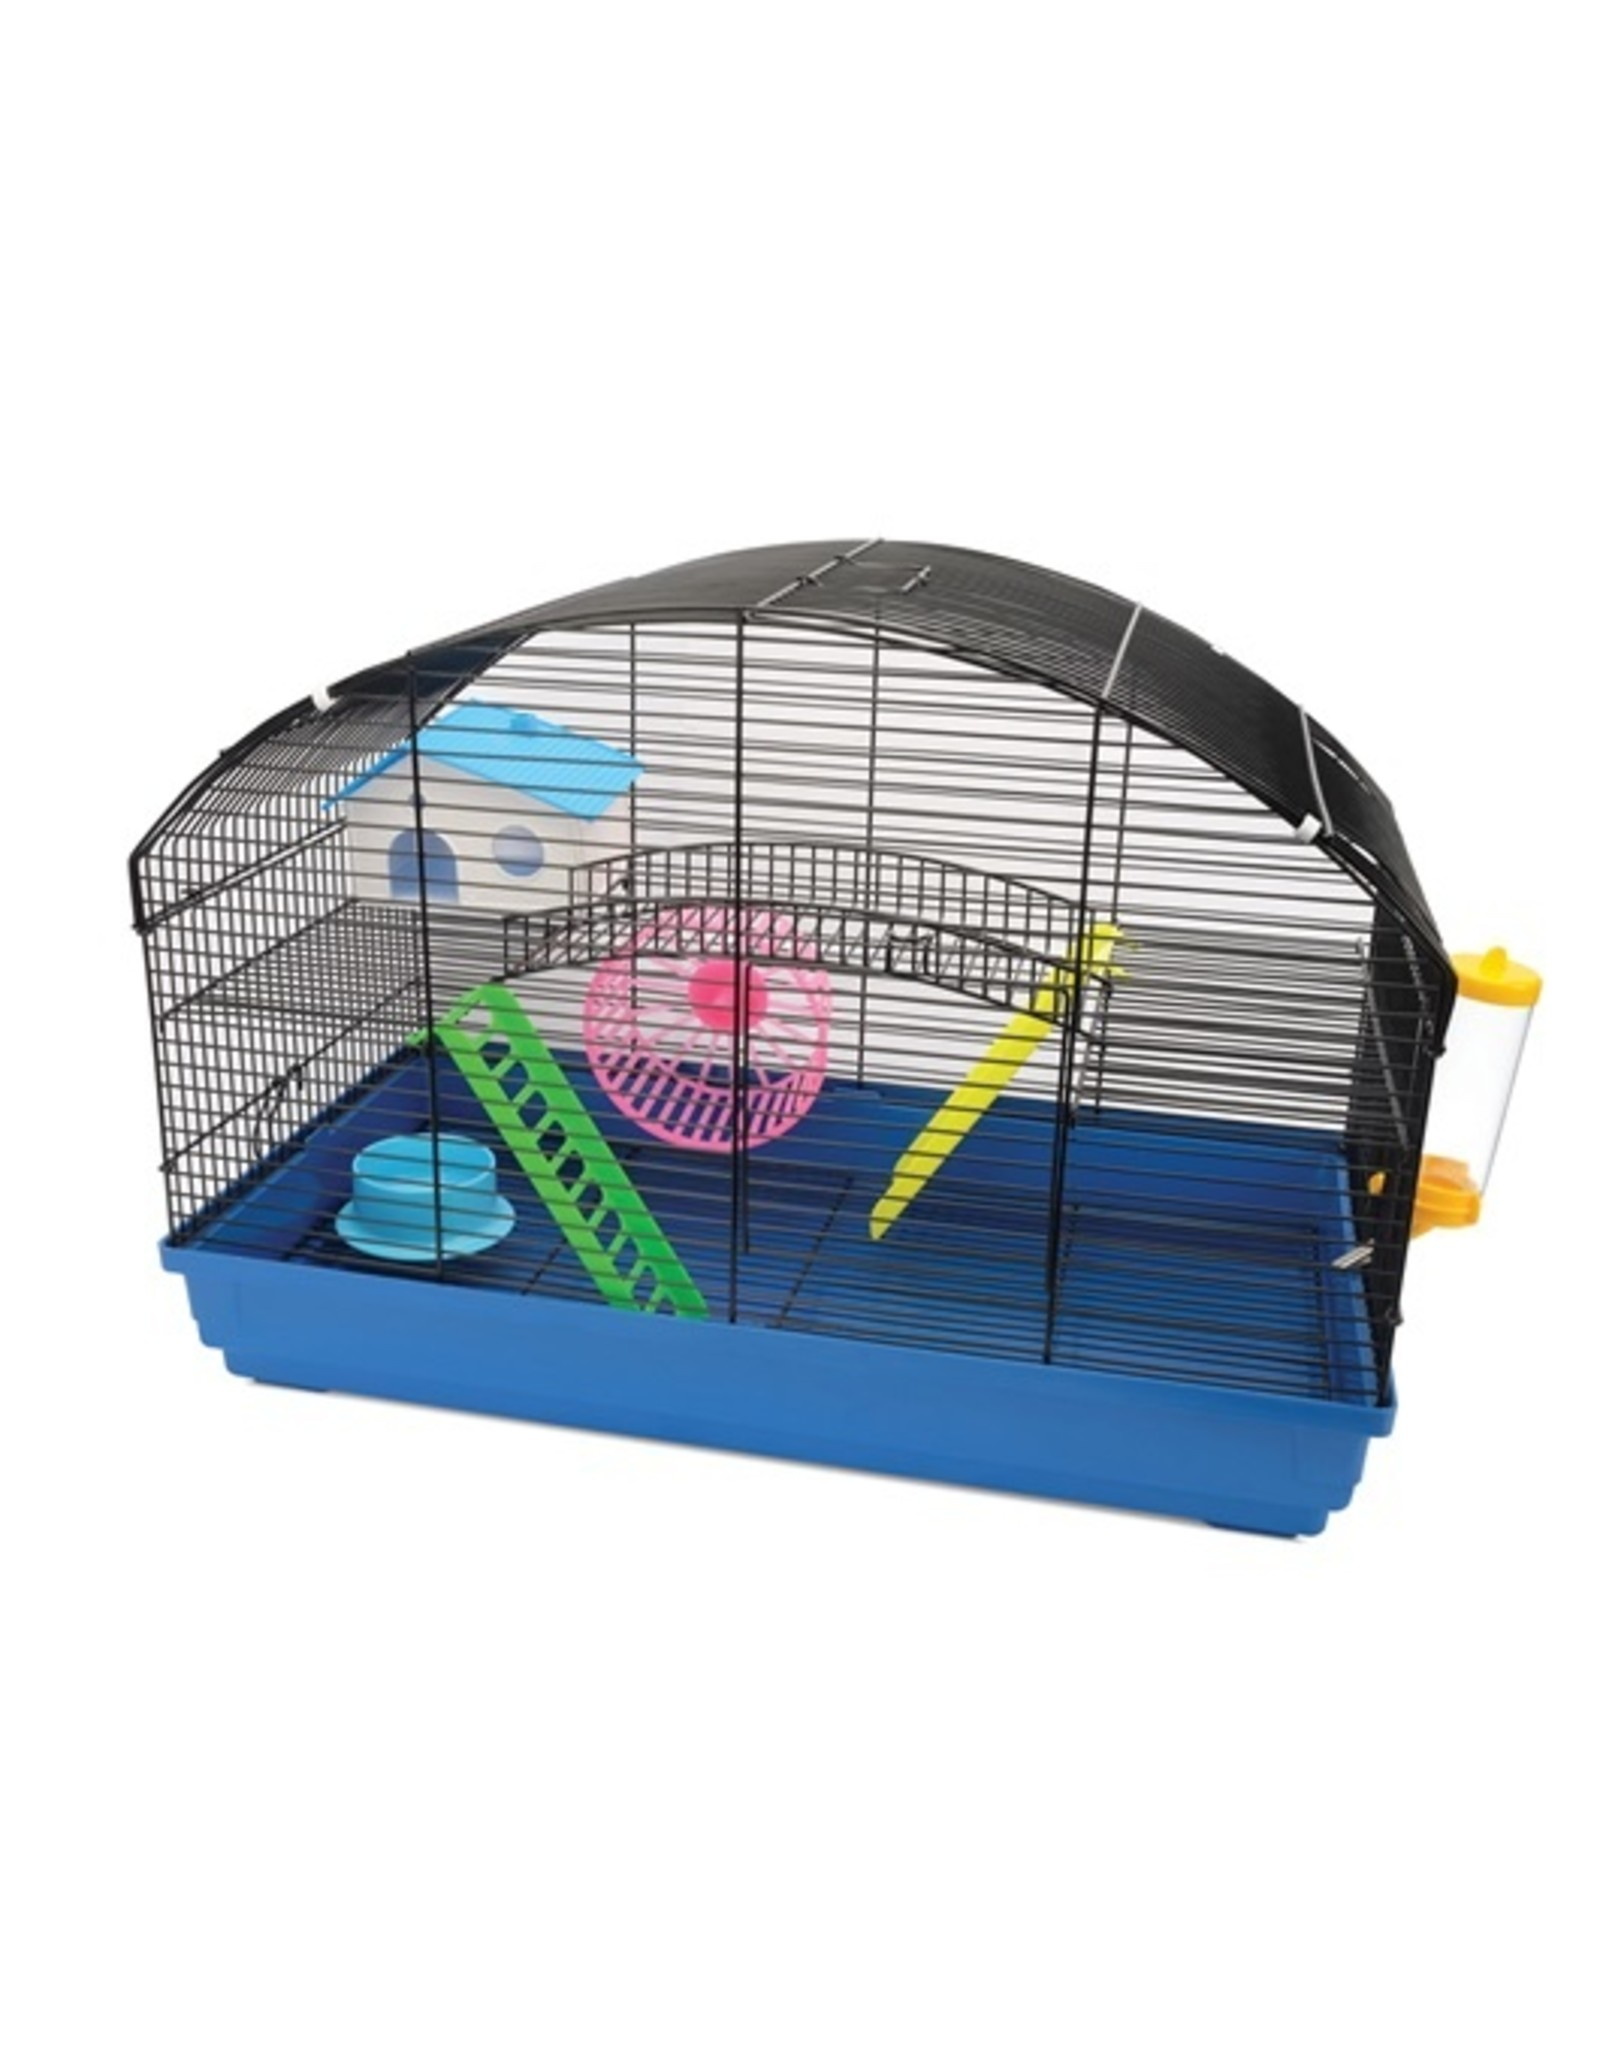 Living World Dwarf Hamster Cage - Villa - 22.8L x 12.5W x 16.1H in